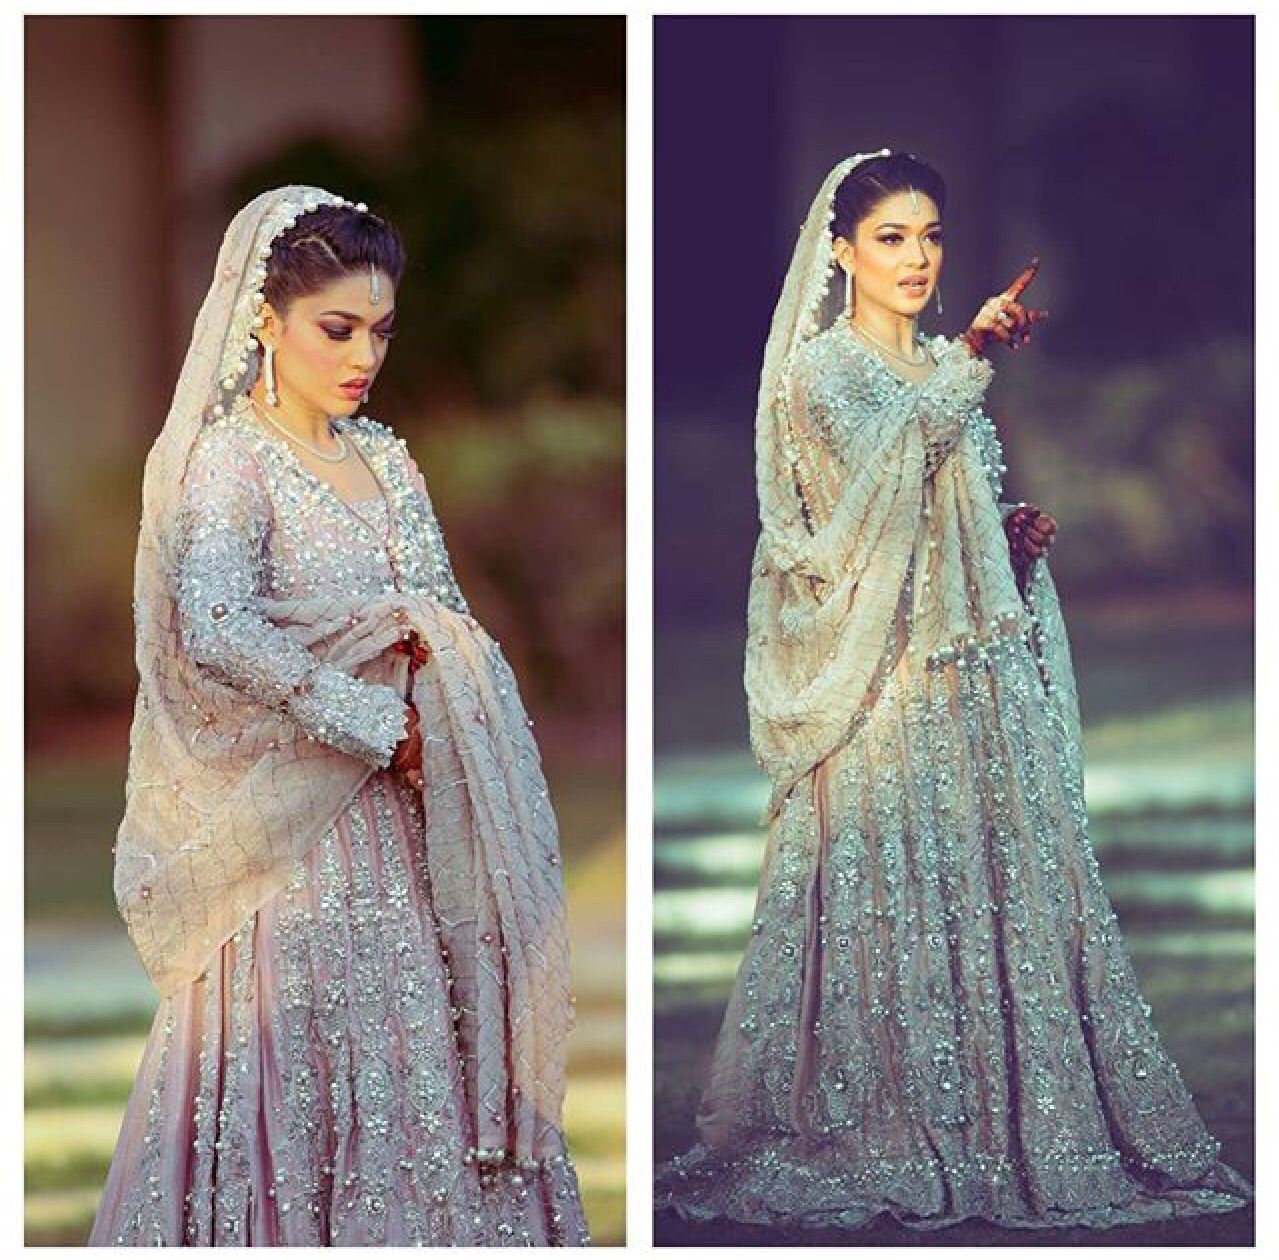 Sanam Jung In Nidaazwer Pakistani Couture Indian Bridal Outfits Pakistani Dress Design Pakistani Wedding Dresses